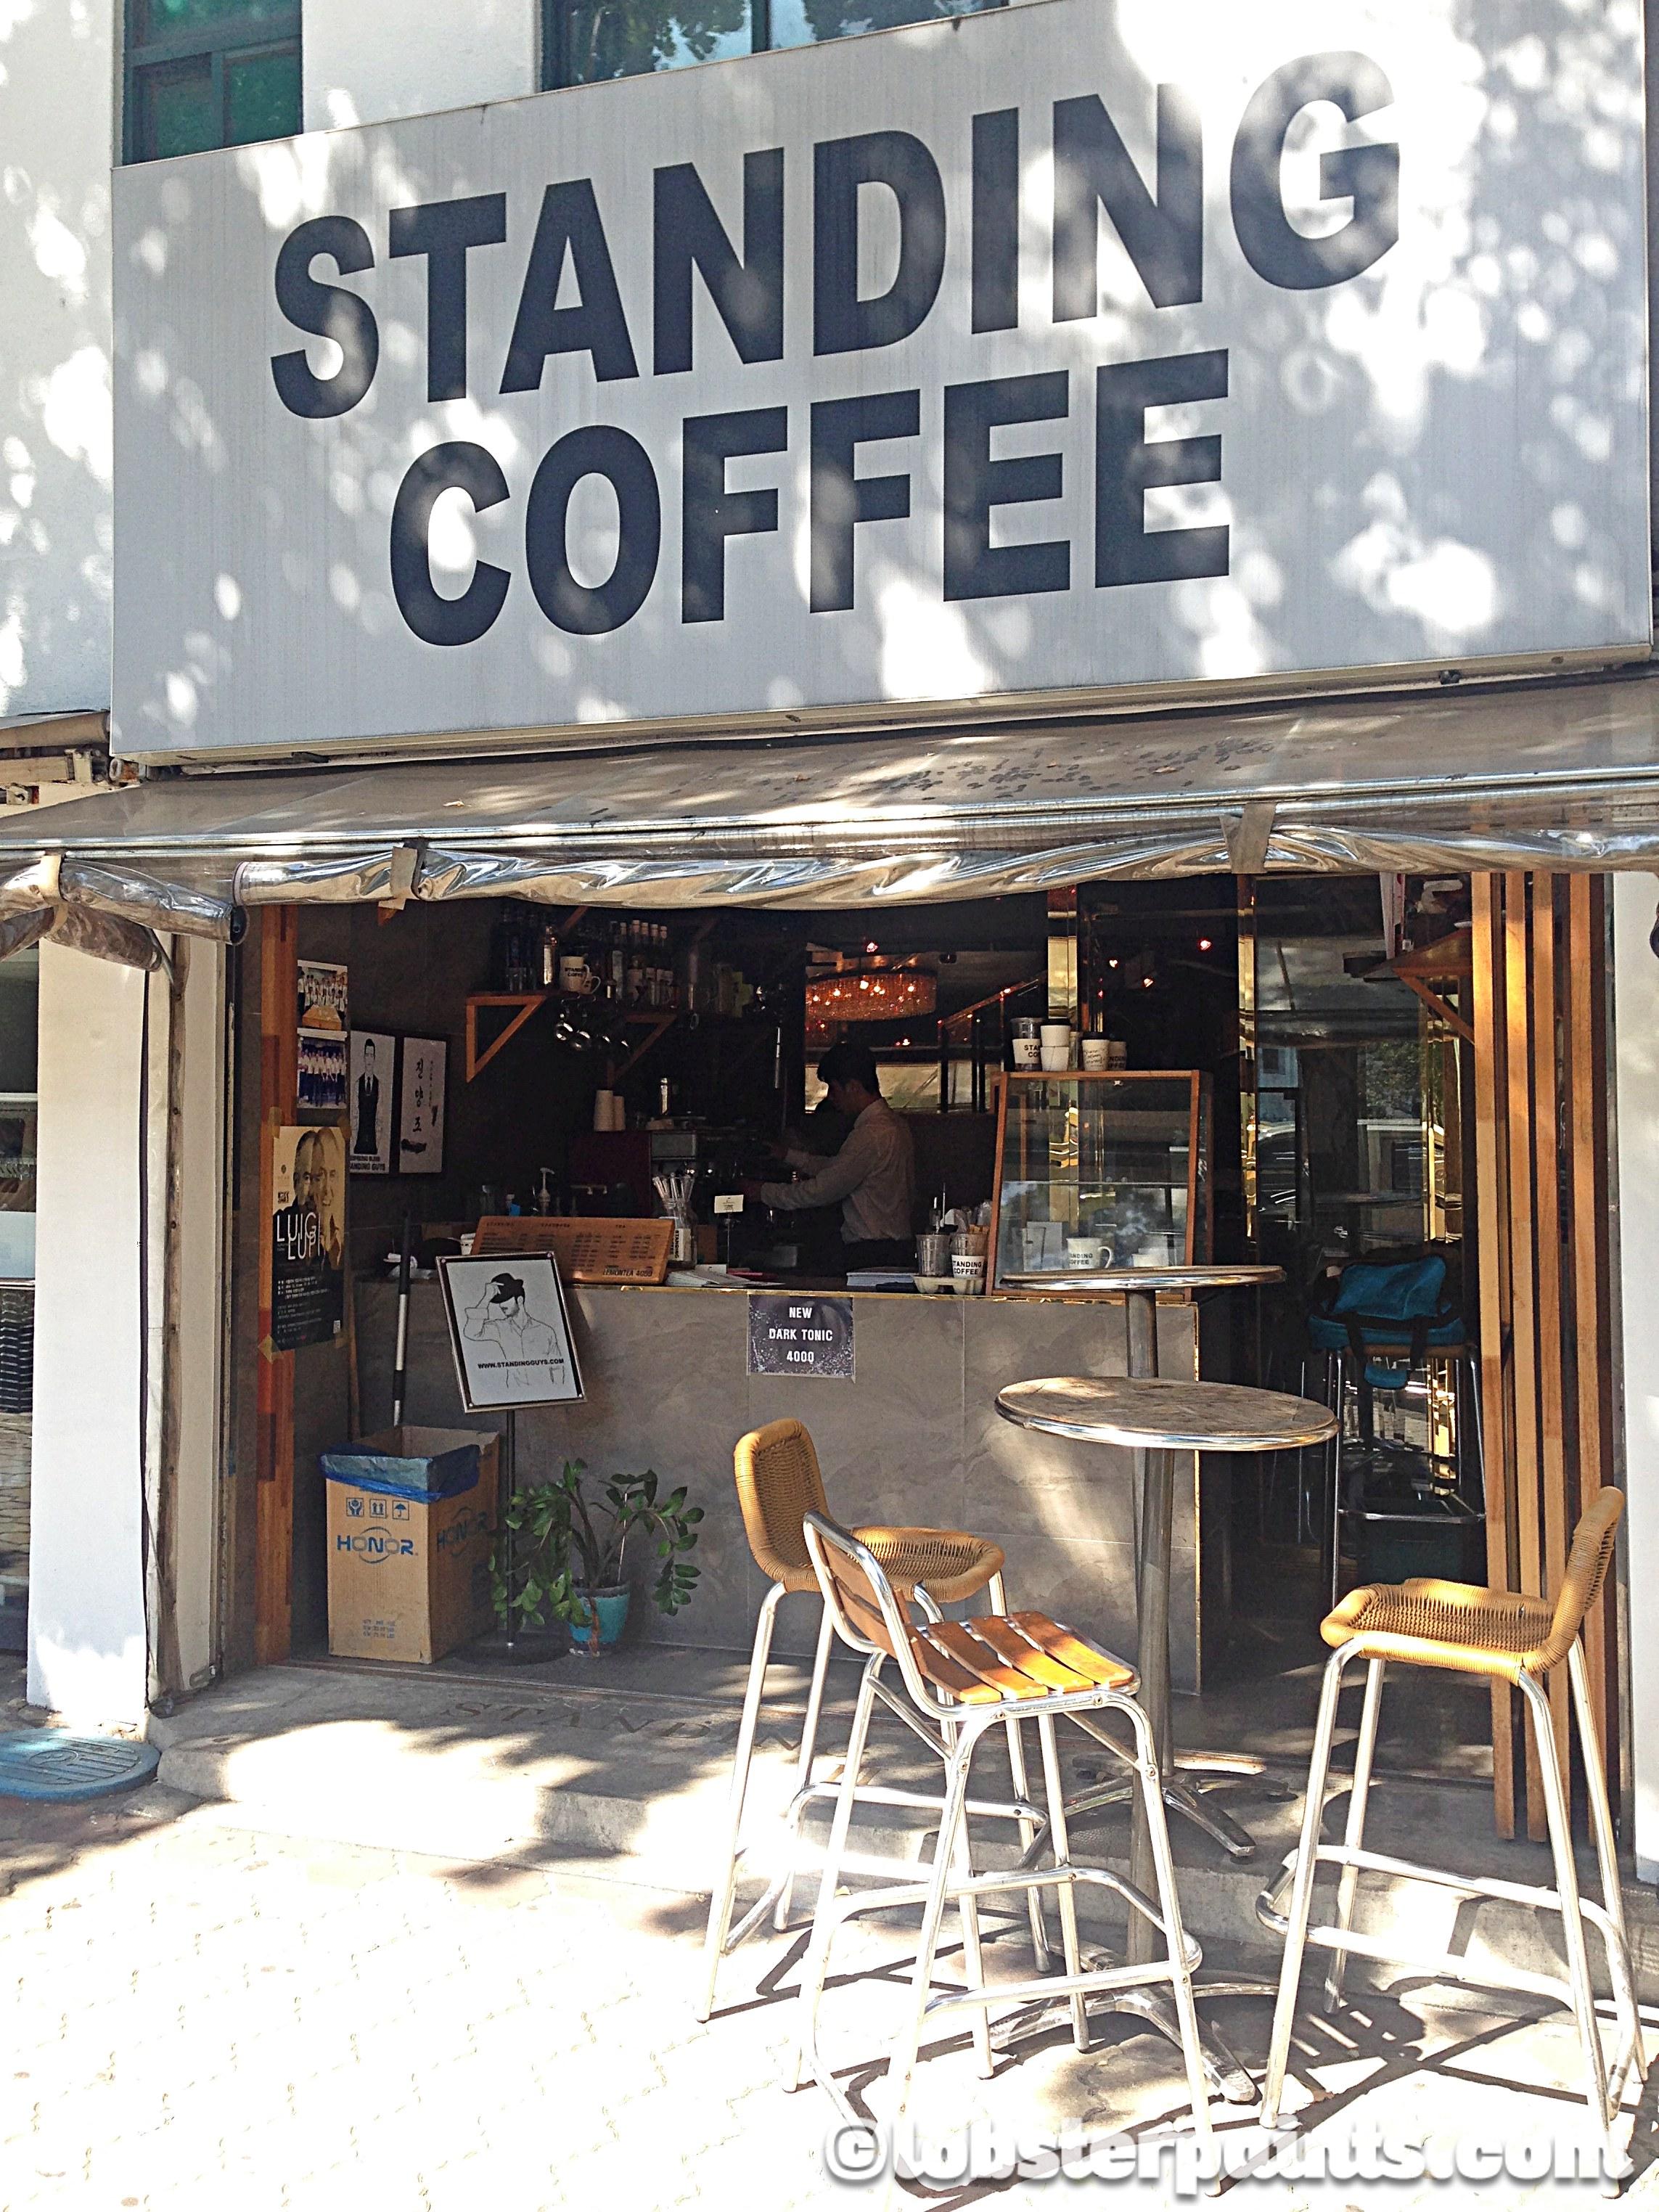 Standing Coffee (Seodaemun Station) | Seoul, South Korea